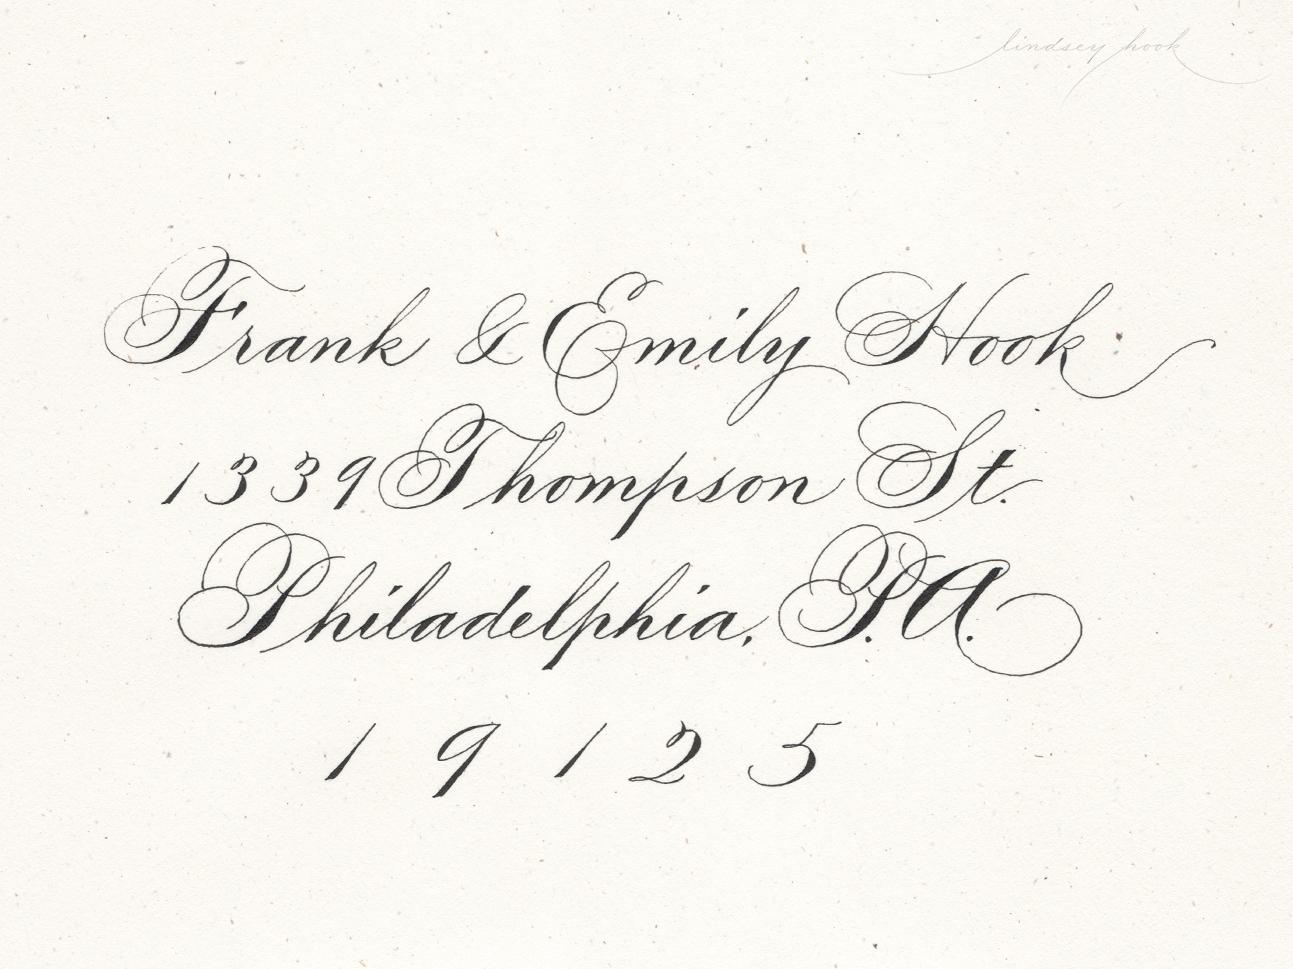 Ornamental/Shaded Spencerian Script Envelope